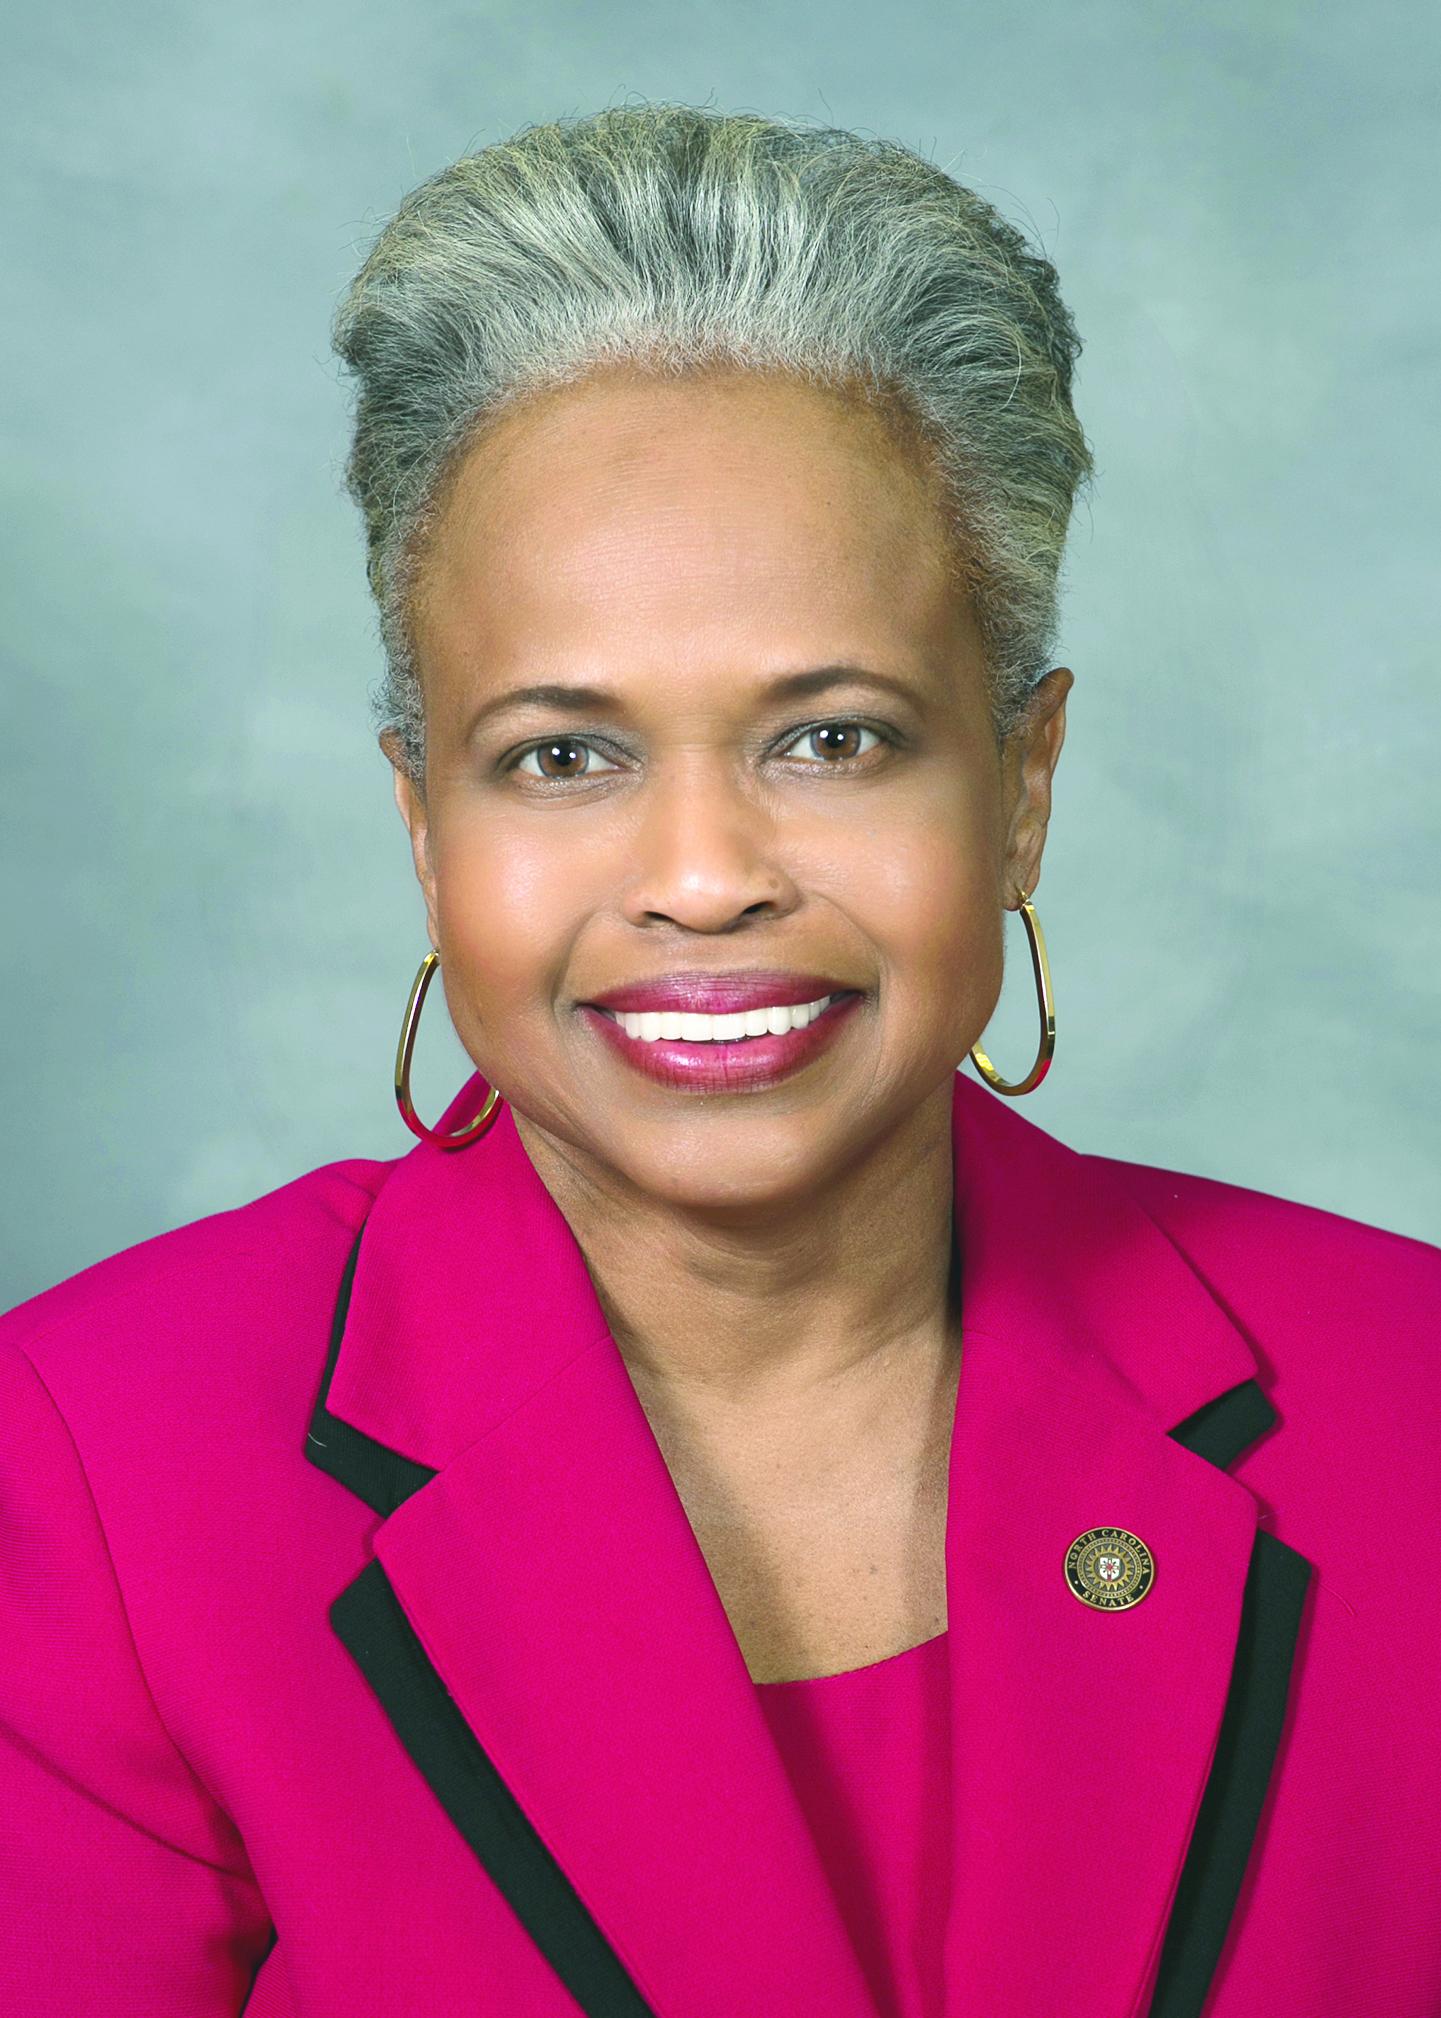 Bills on parade! Your legislators at work | The NC Triad's ...